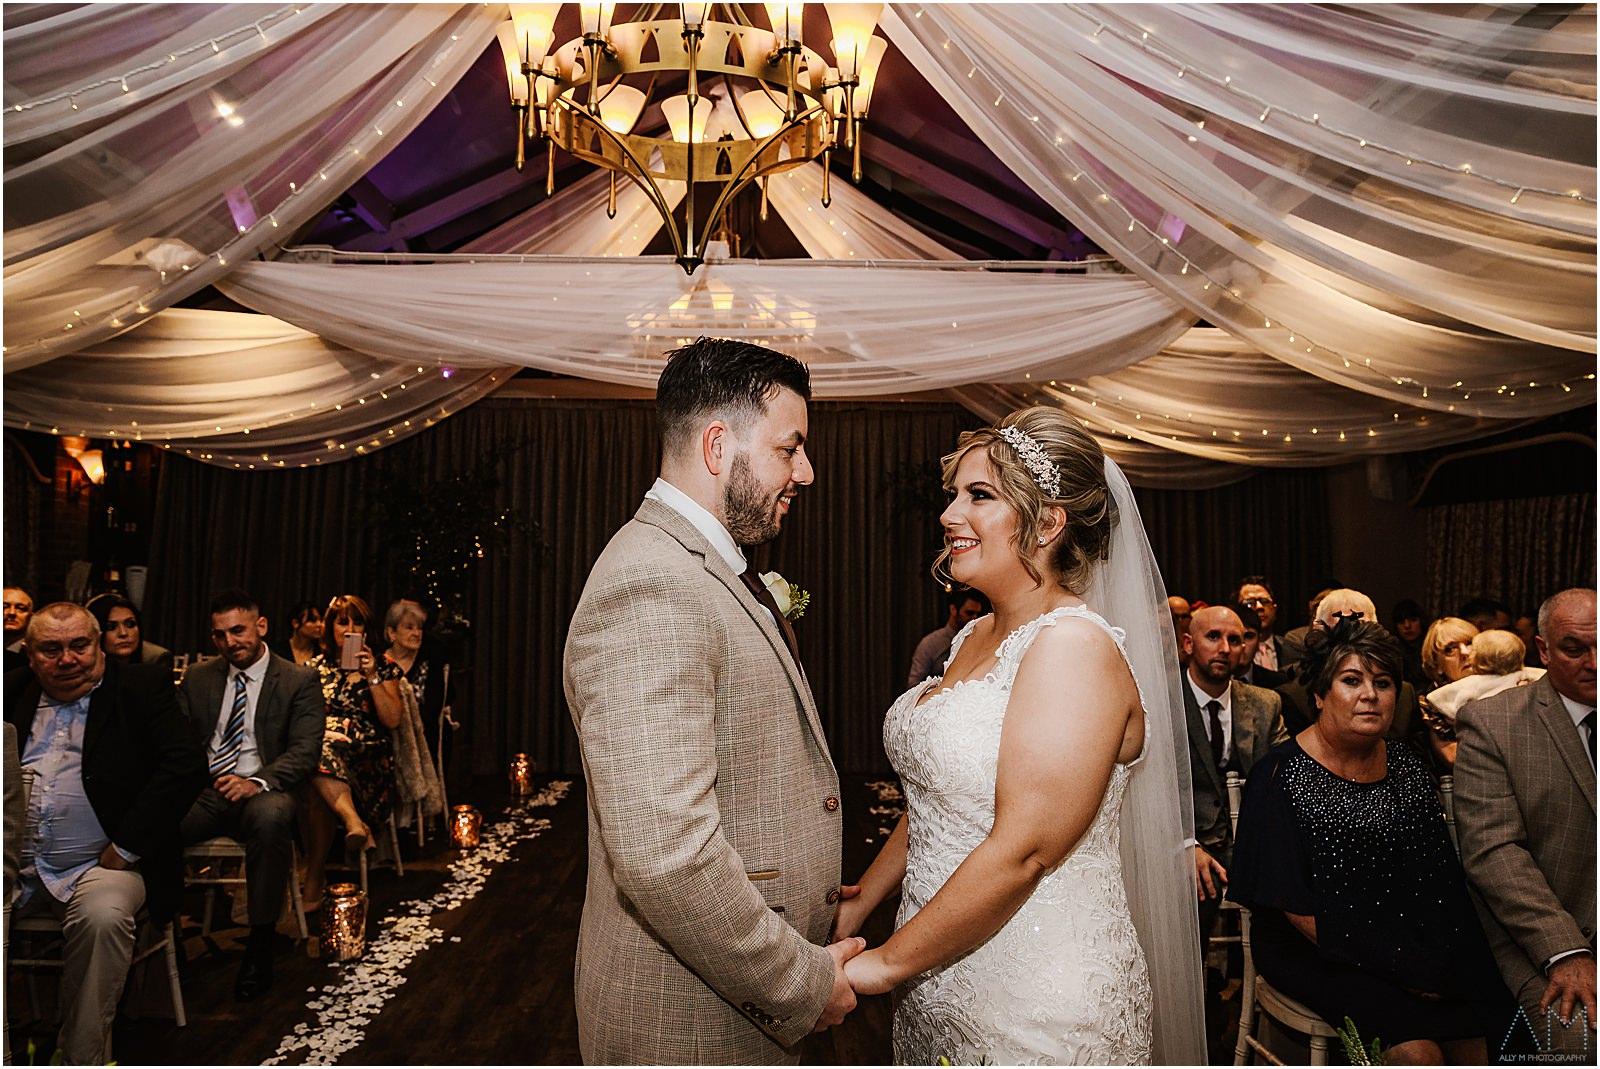 Bartle hall wedding ceremony